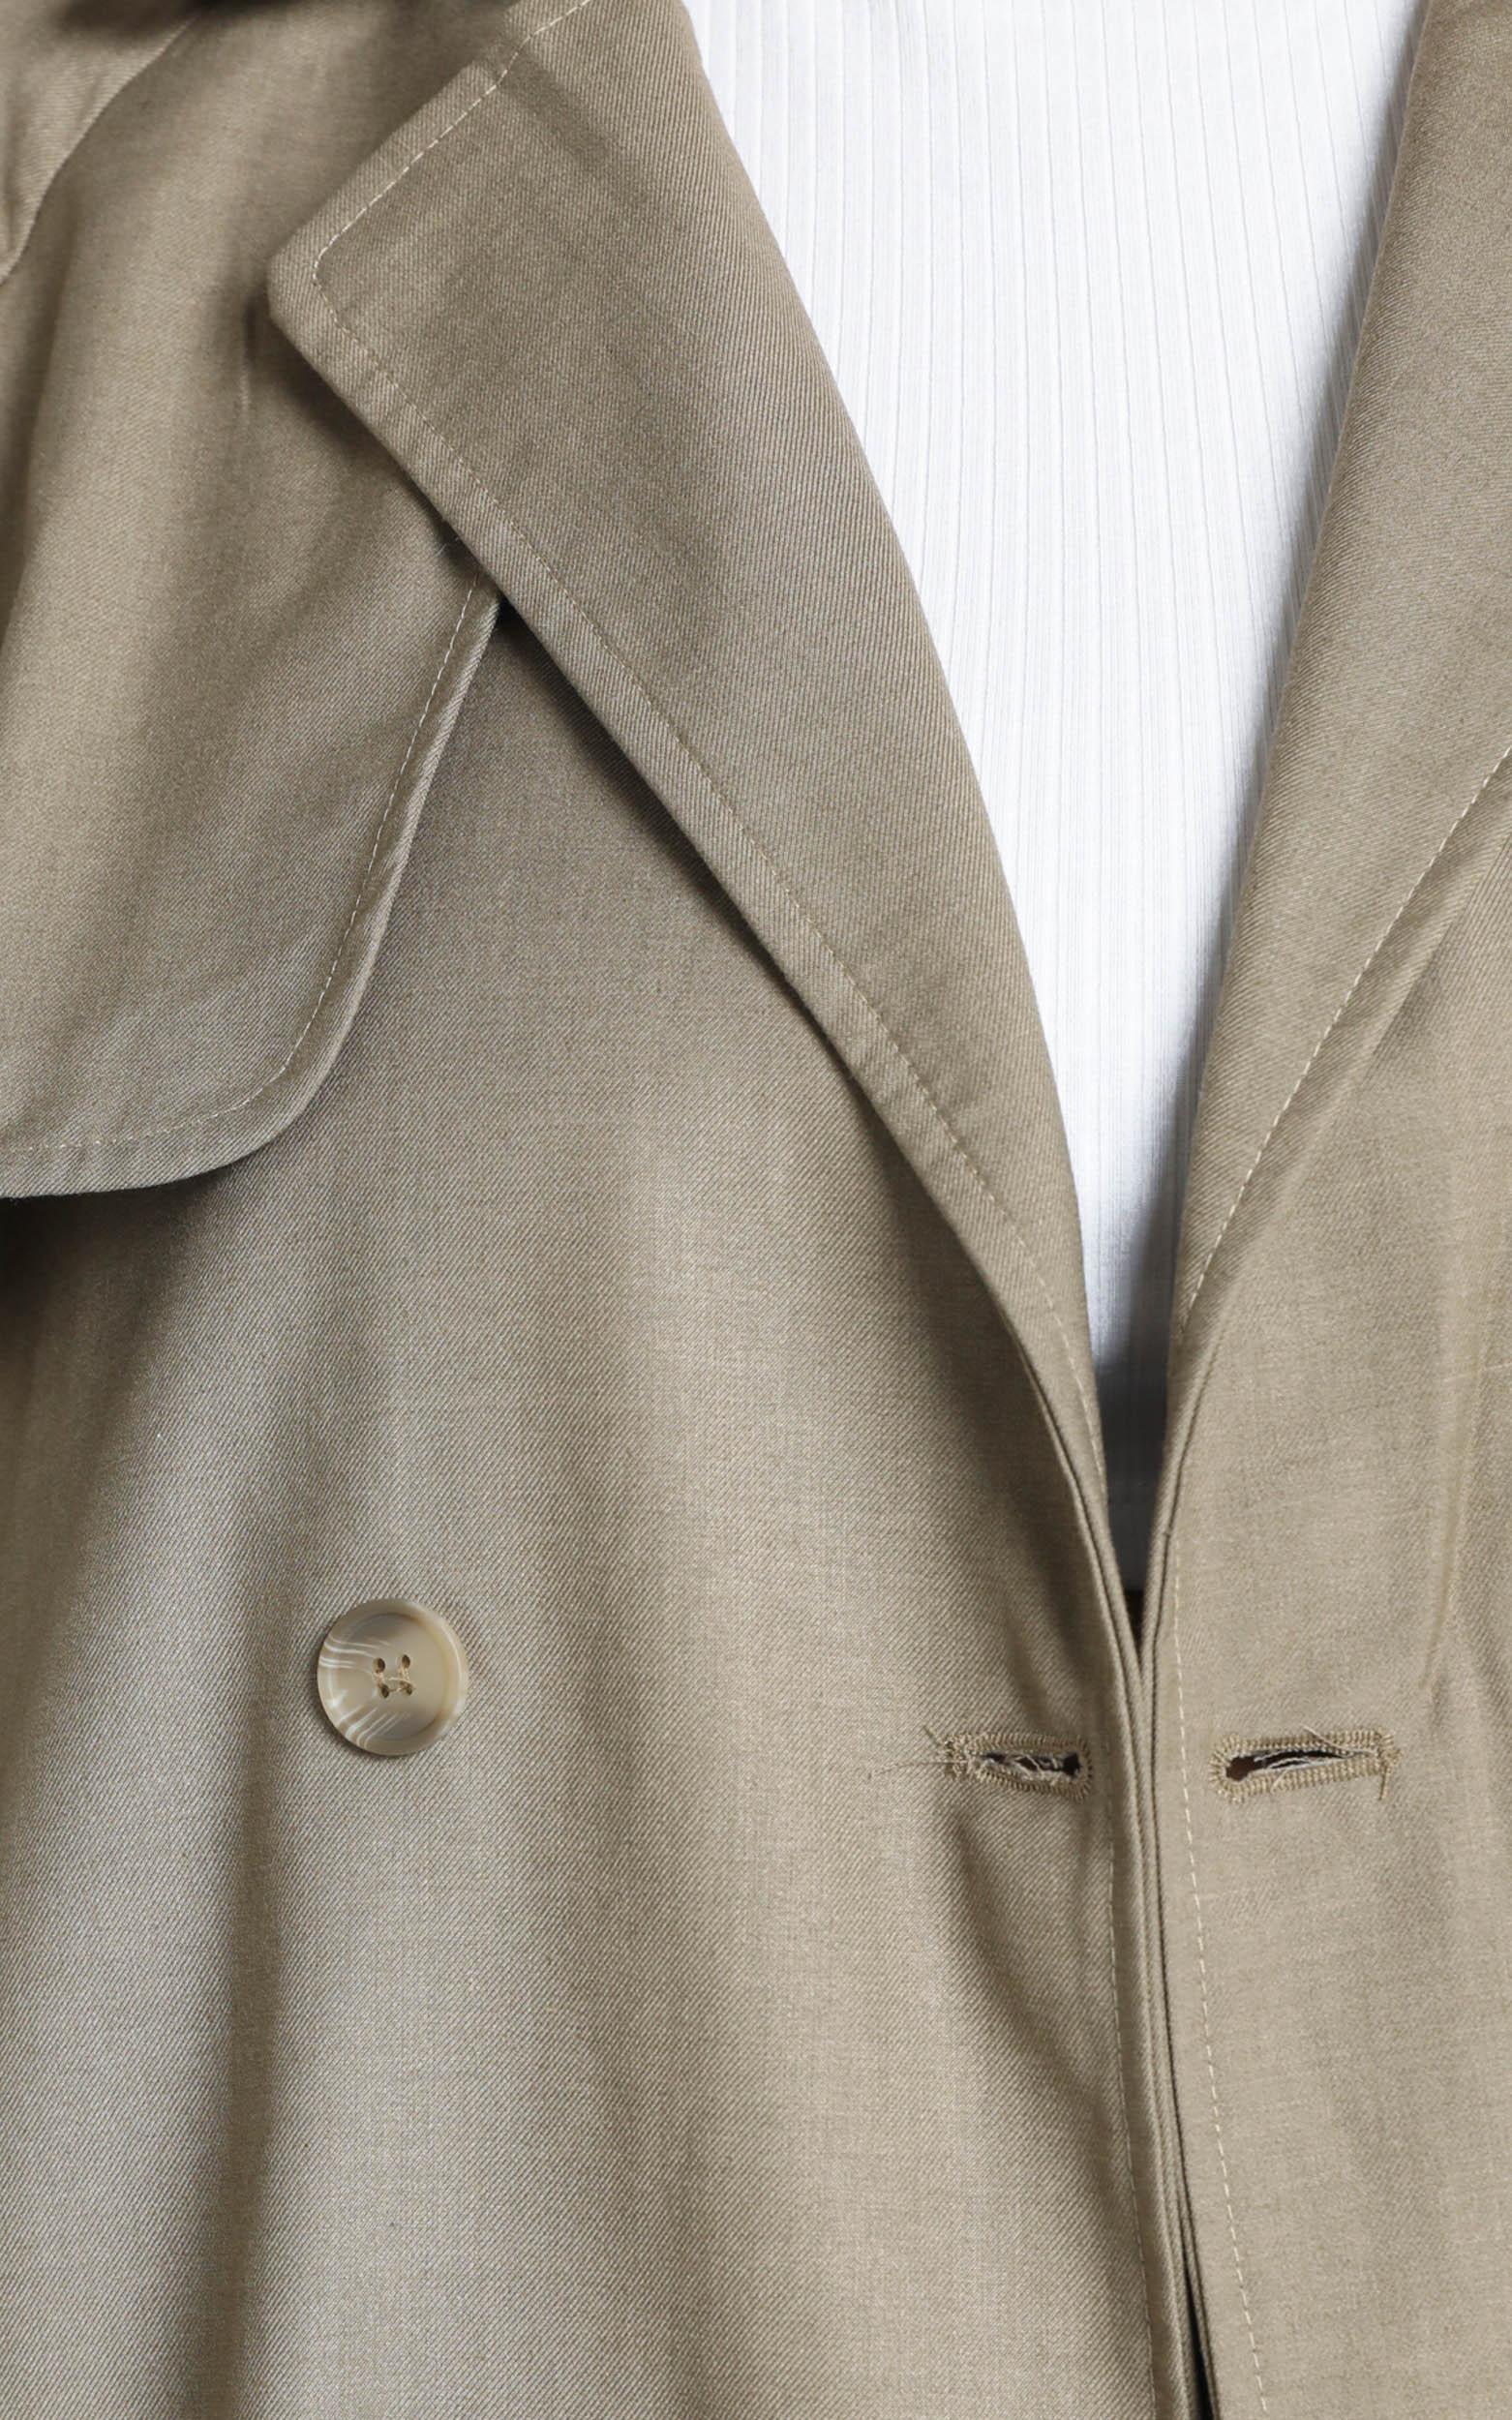 Lioness - Treacherous Long Coat in Beige - 12 (L), Beige, hi-res image number null